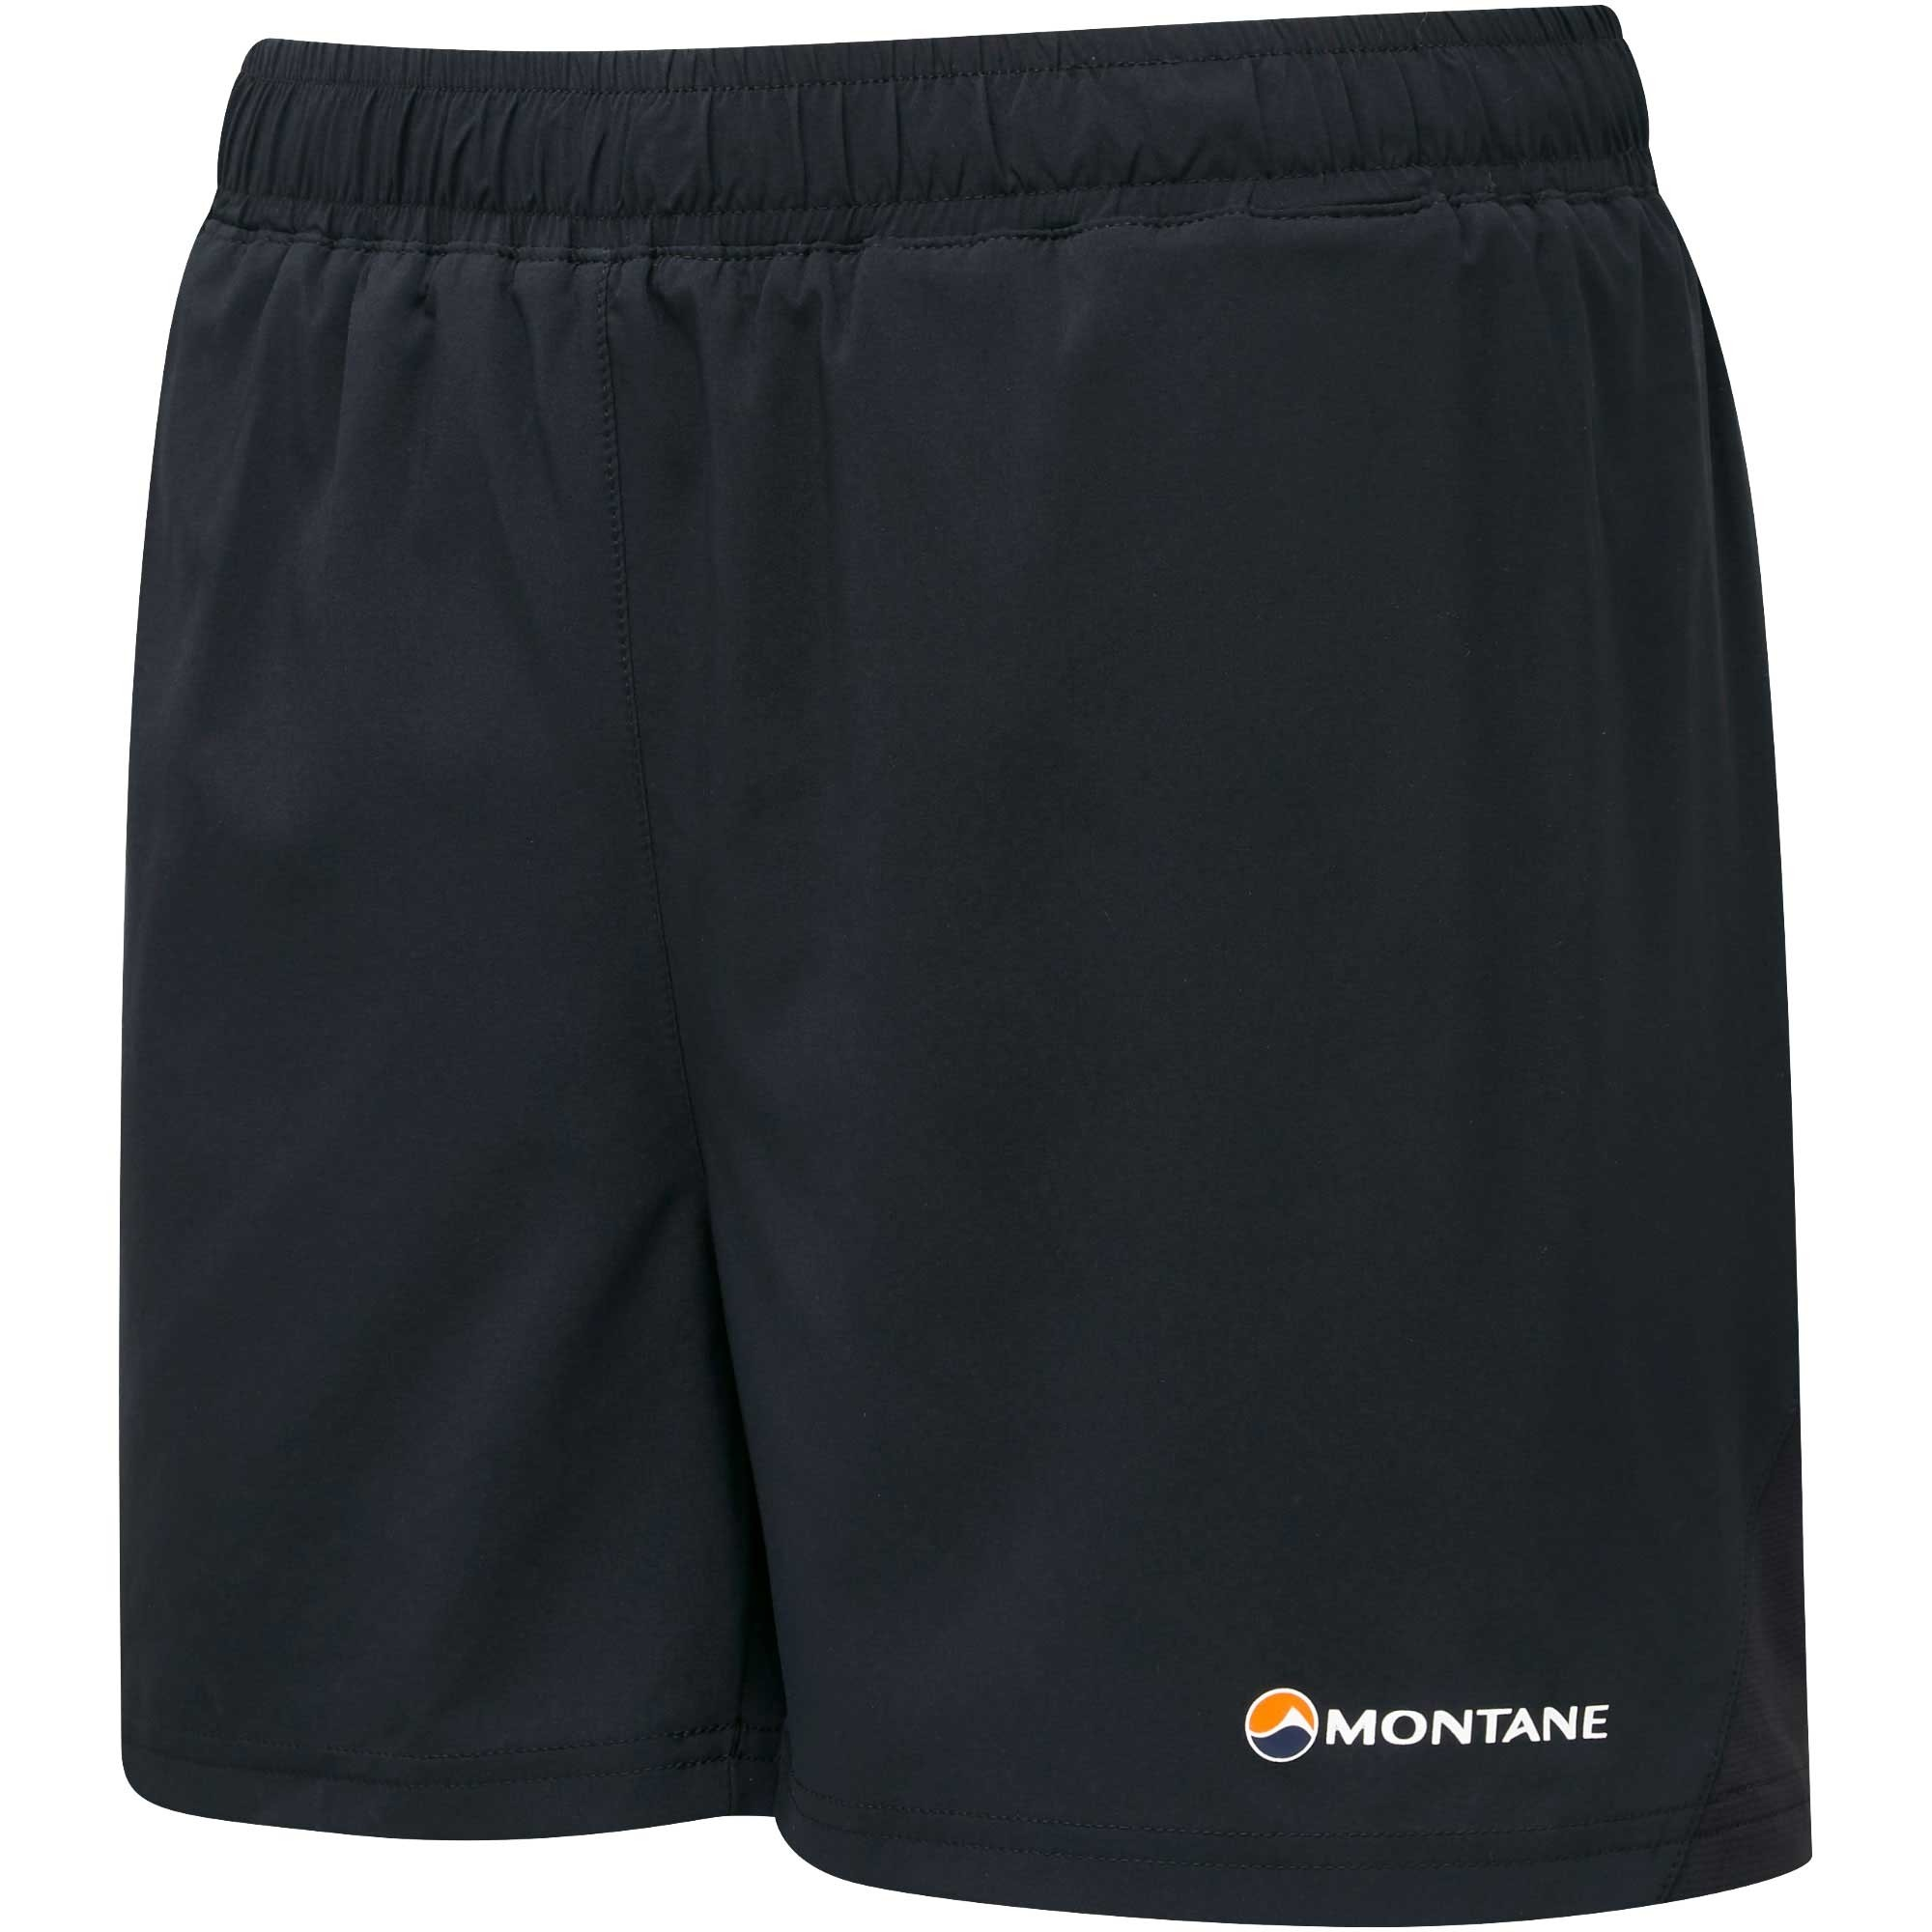 Montane Claw Women's Running Shorts - Black